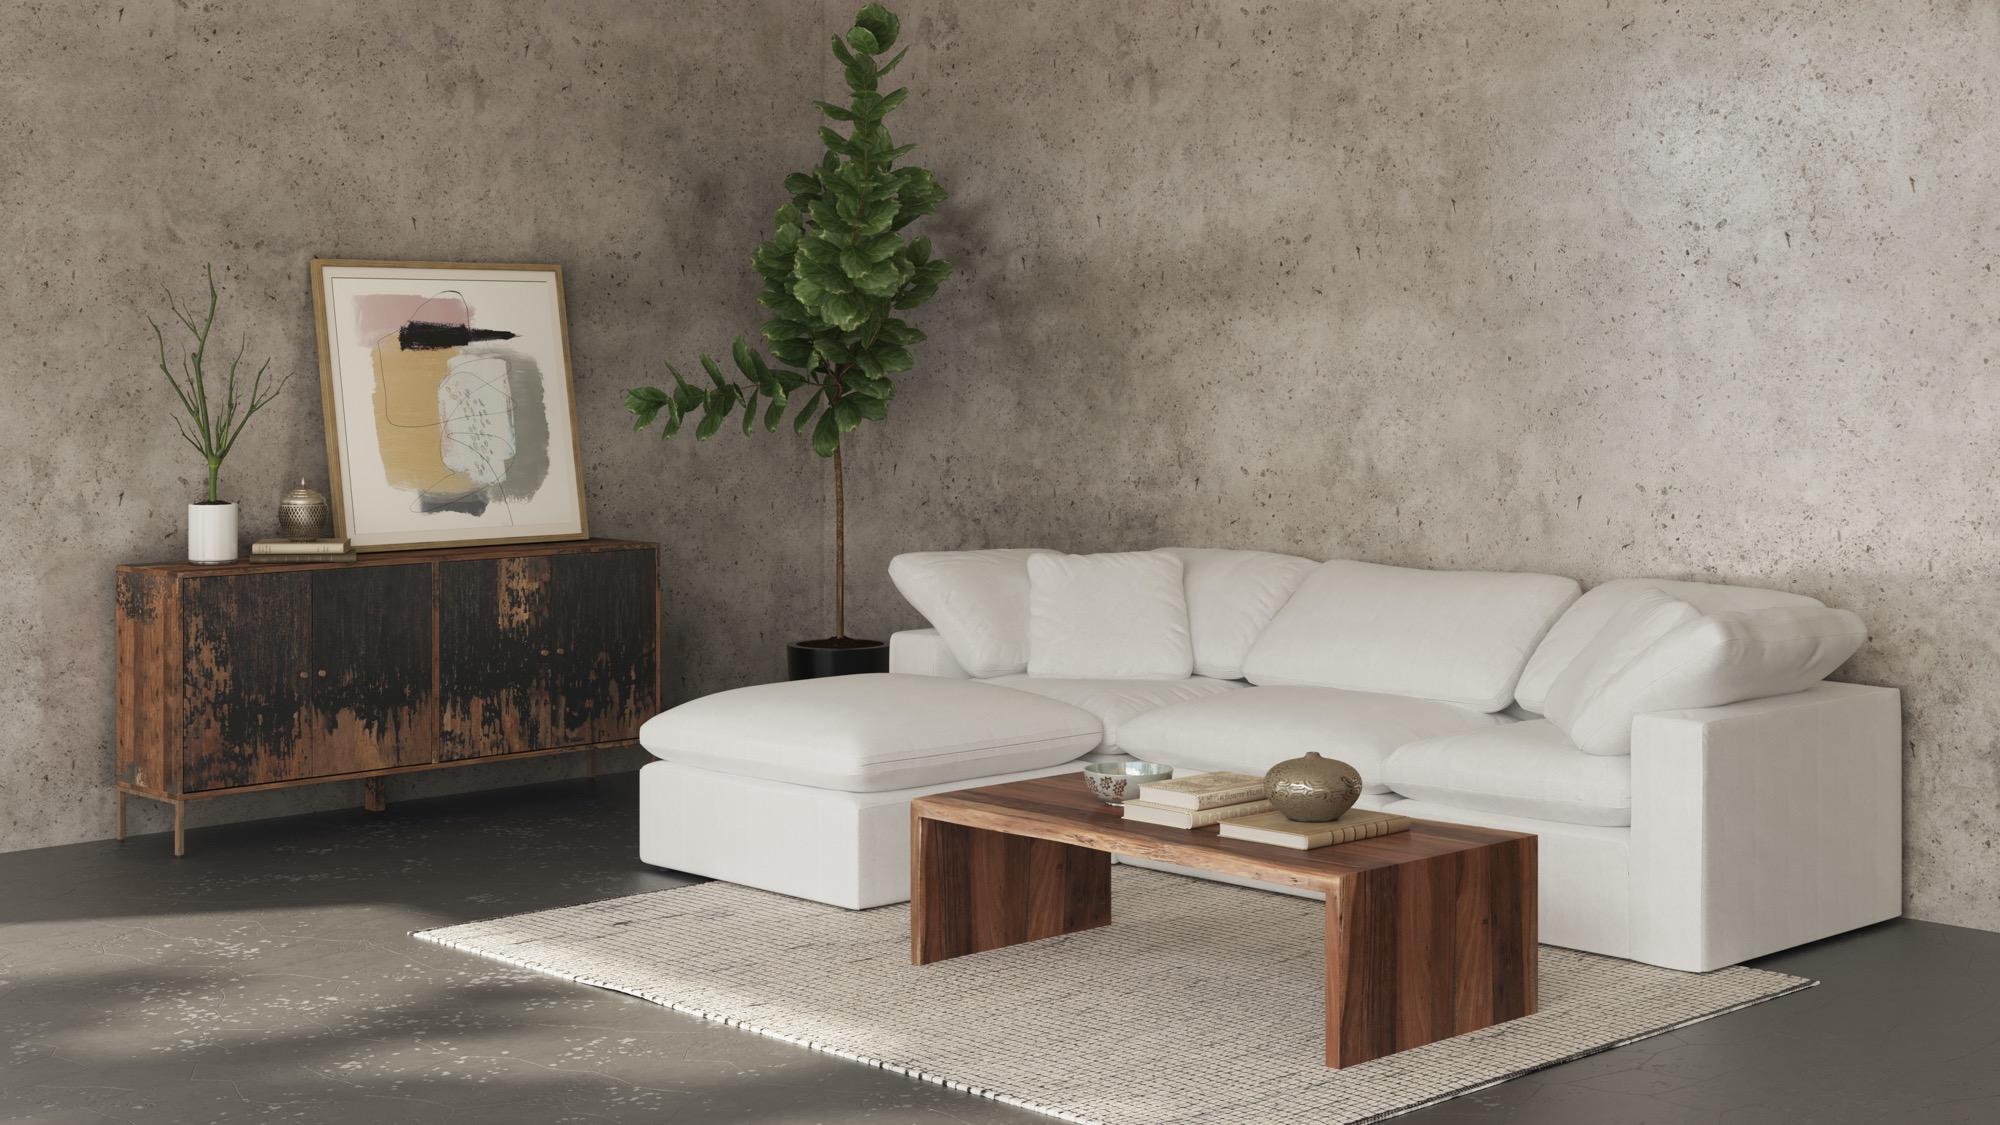 Terra condo lounge white modular sectional sofa in a beautiful living room